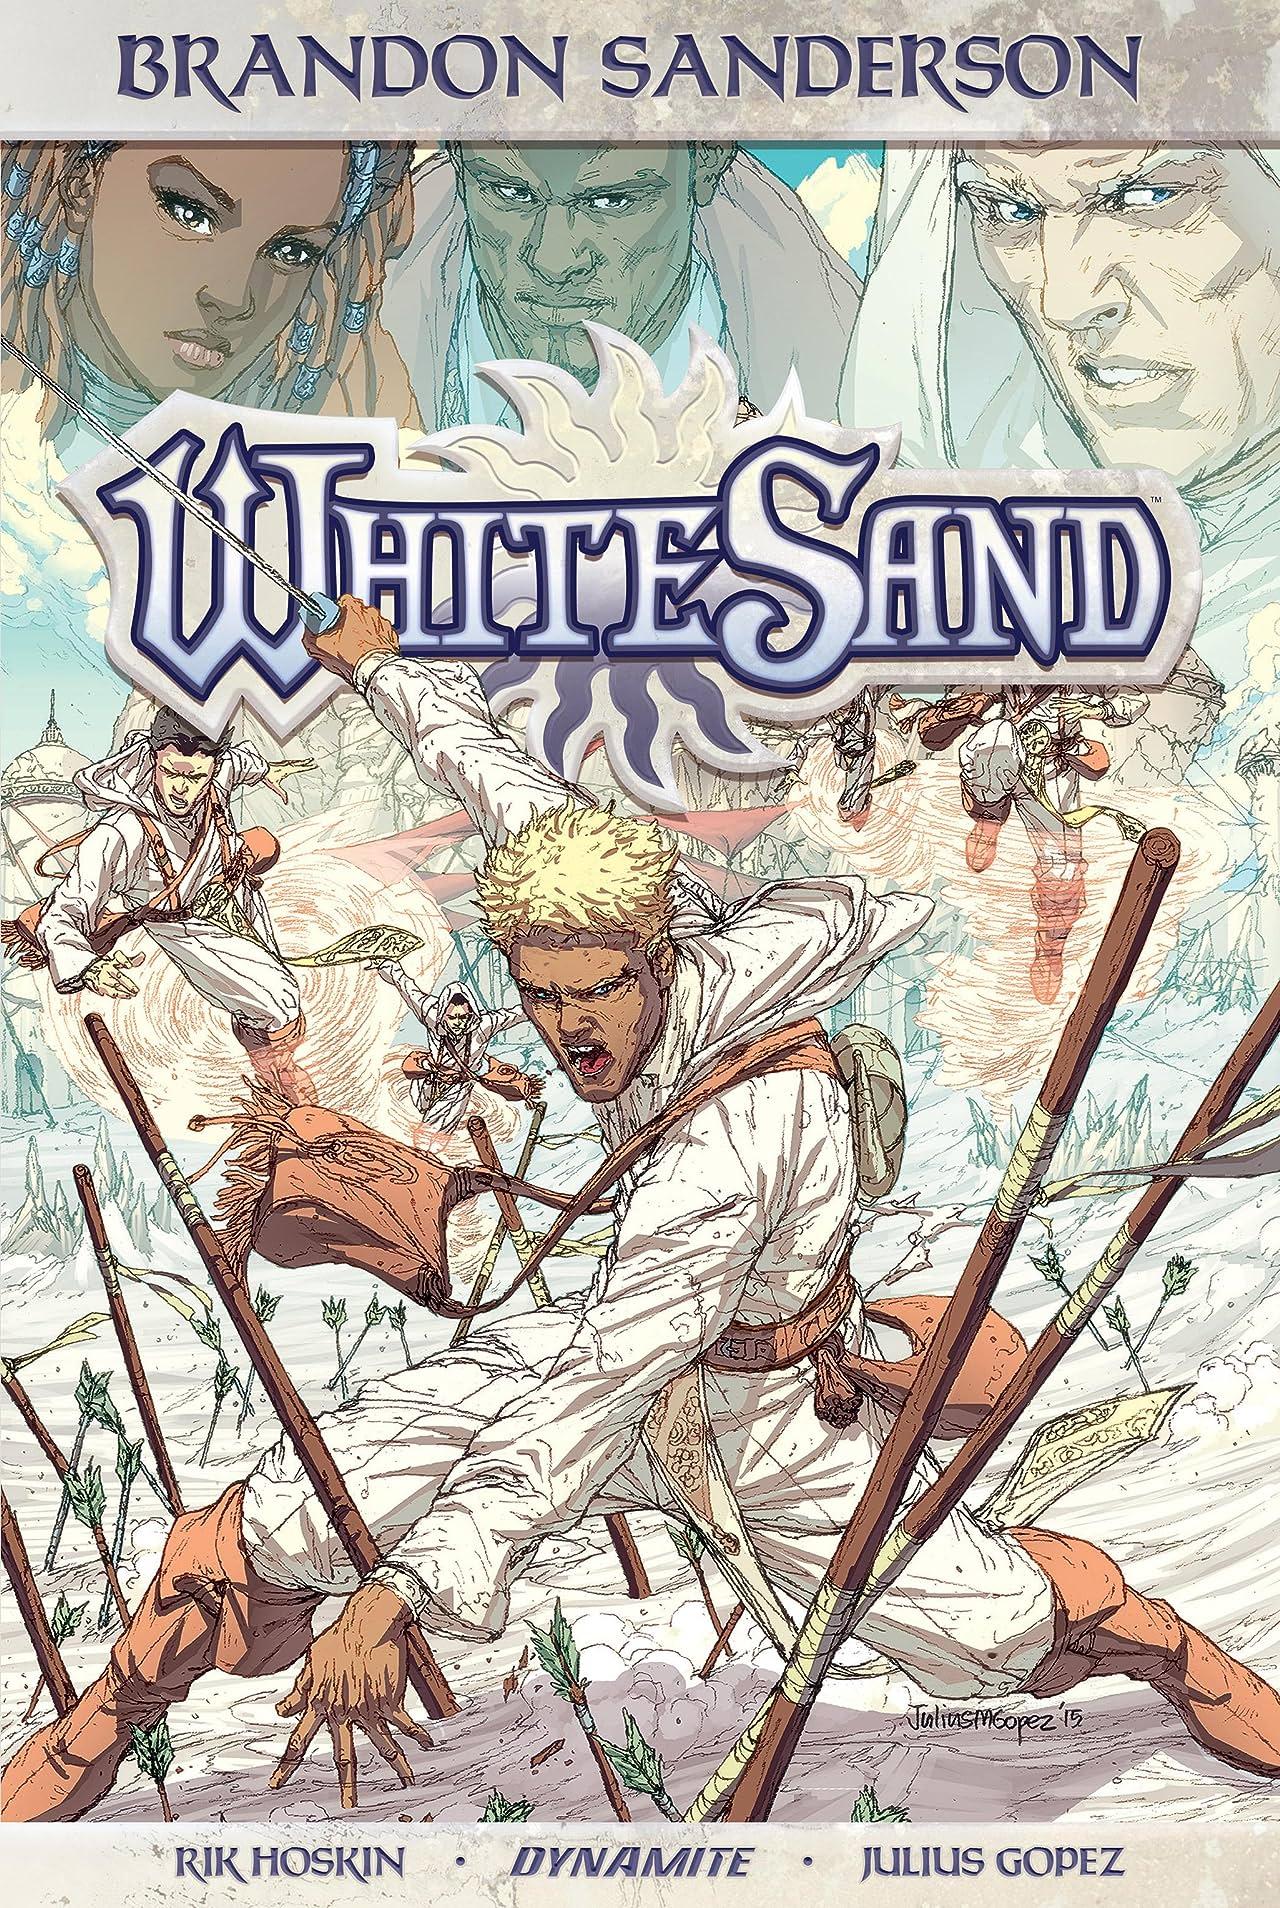 Brandon Sanderson's White Sand Tome 1